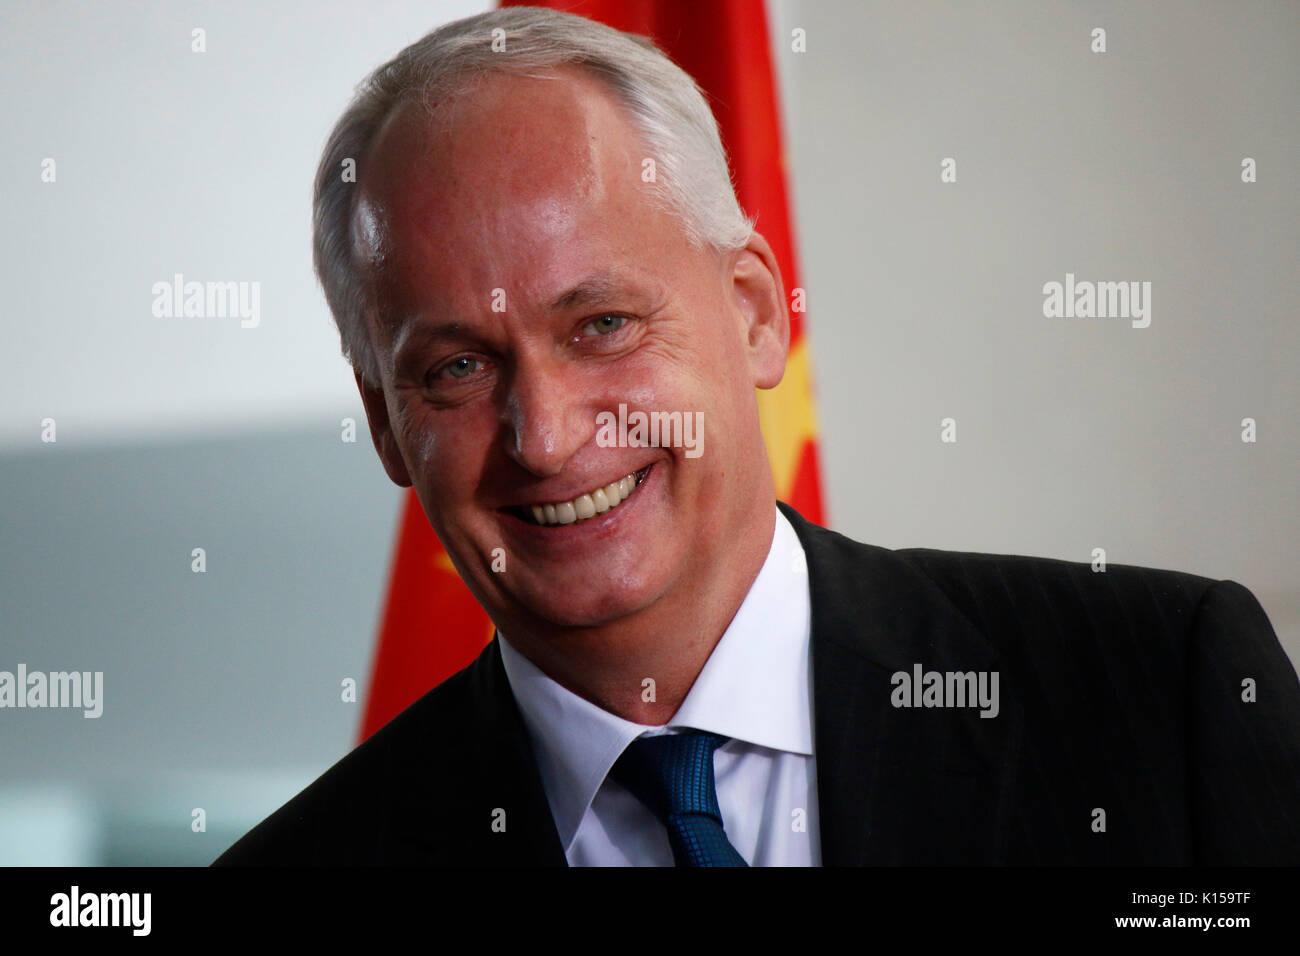 Hubertus Troska - Treffen der dt. Bundeskanzlerin mit dem chinesischen Staatspraeisdenten, Bundeskanzleramt, 5. Juli 2017, Berlin. - Stock Image